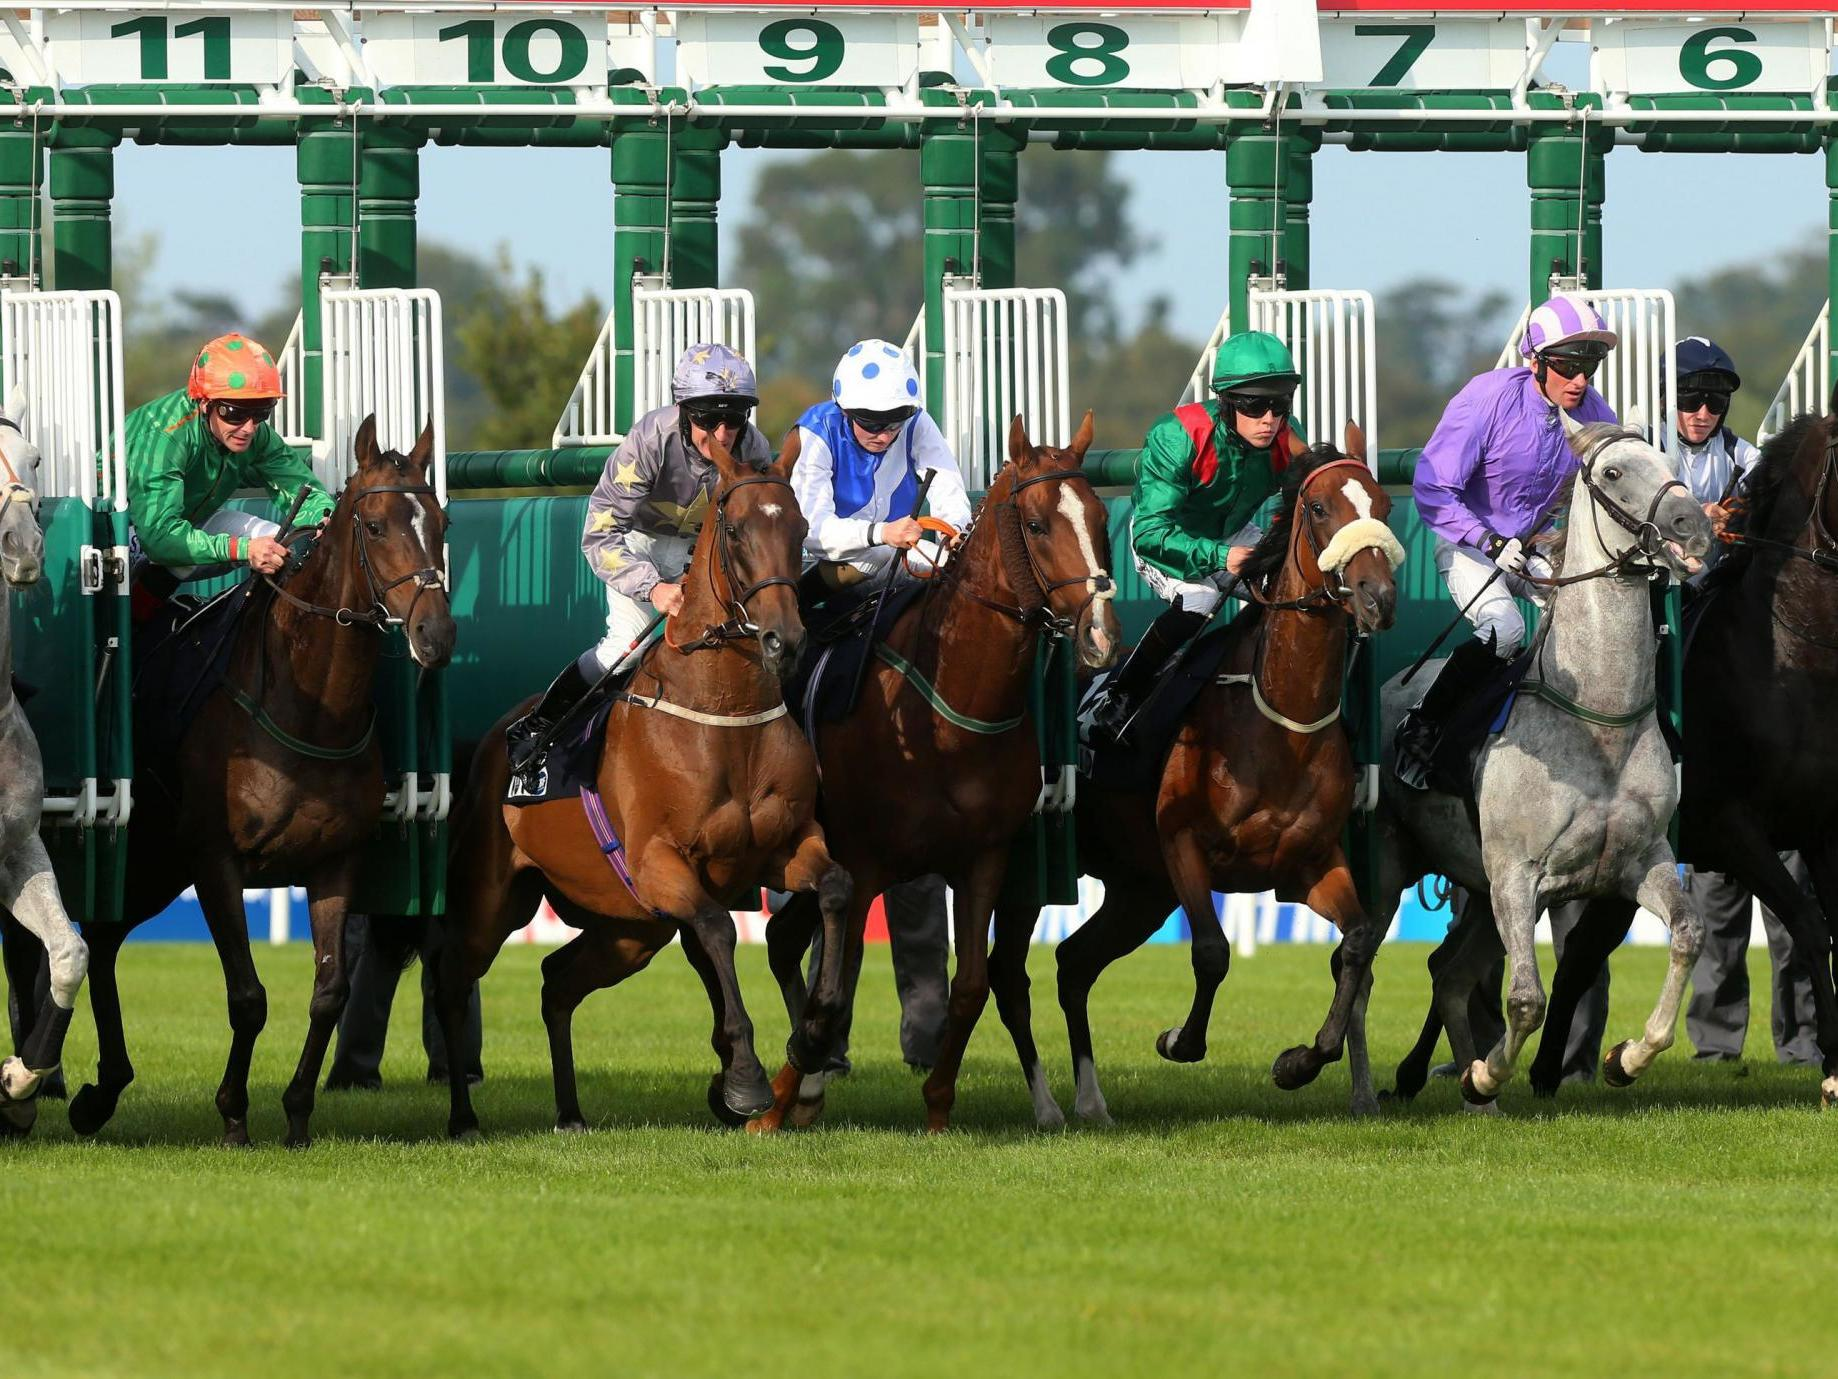 Racing to resume in Ireland behind closed doors next month